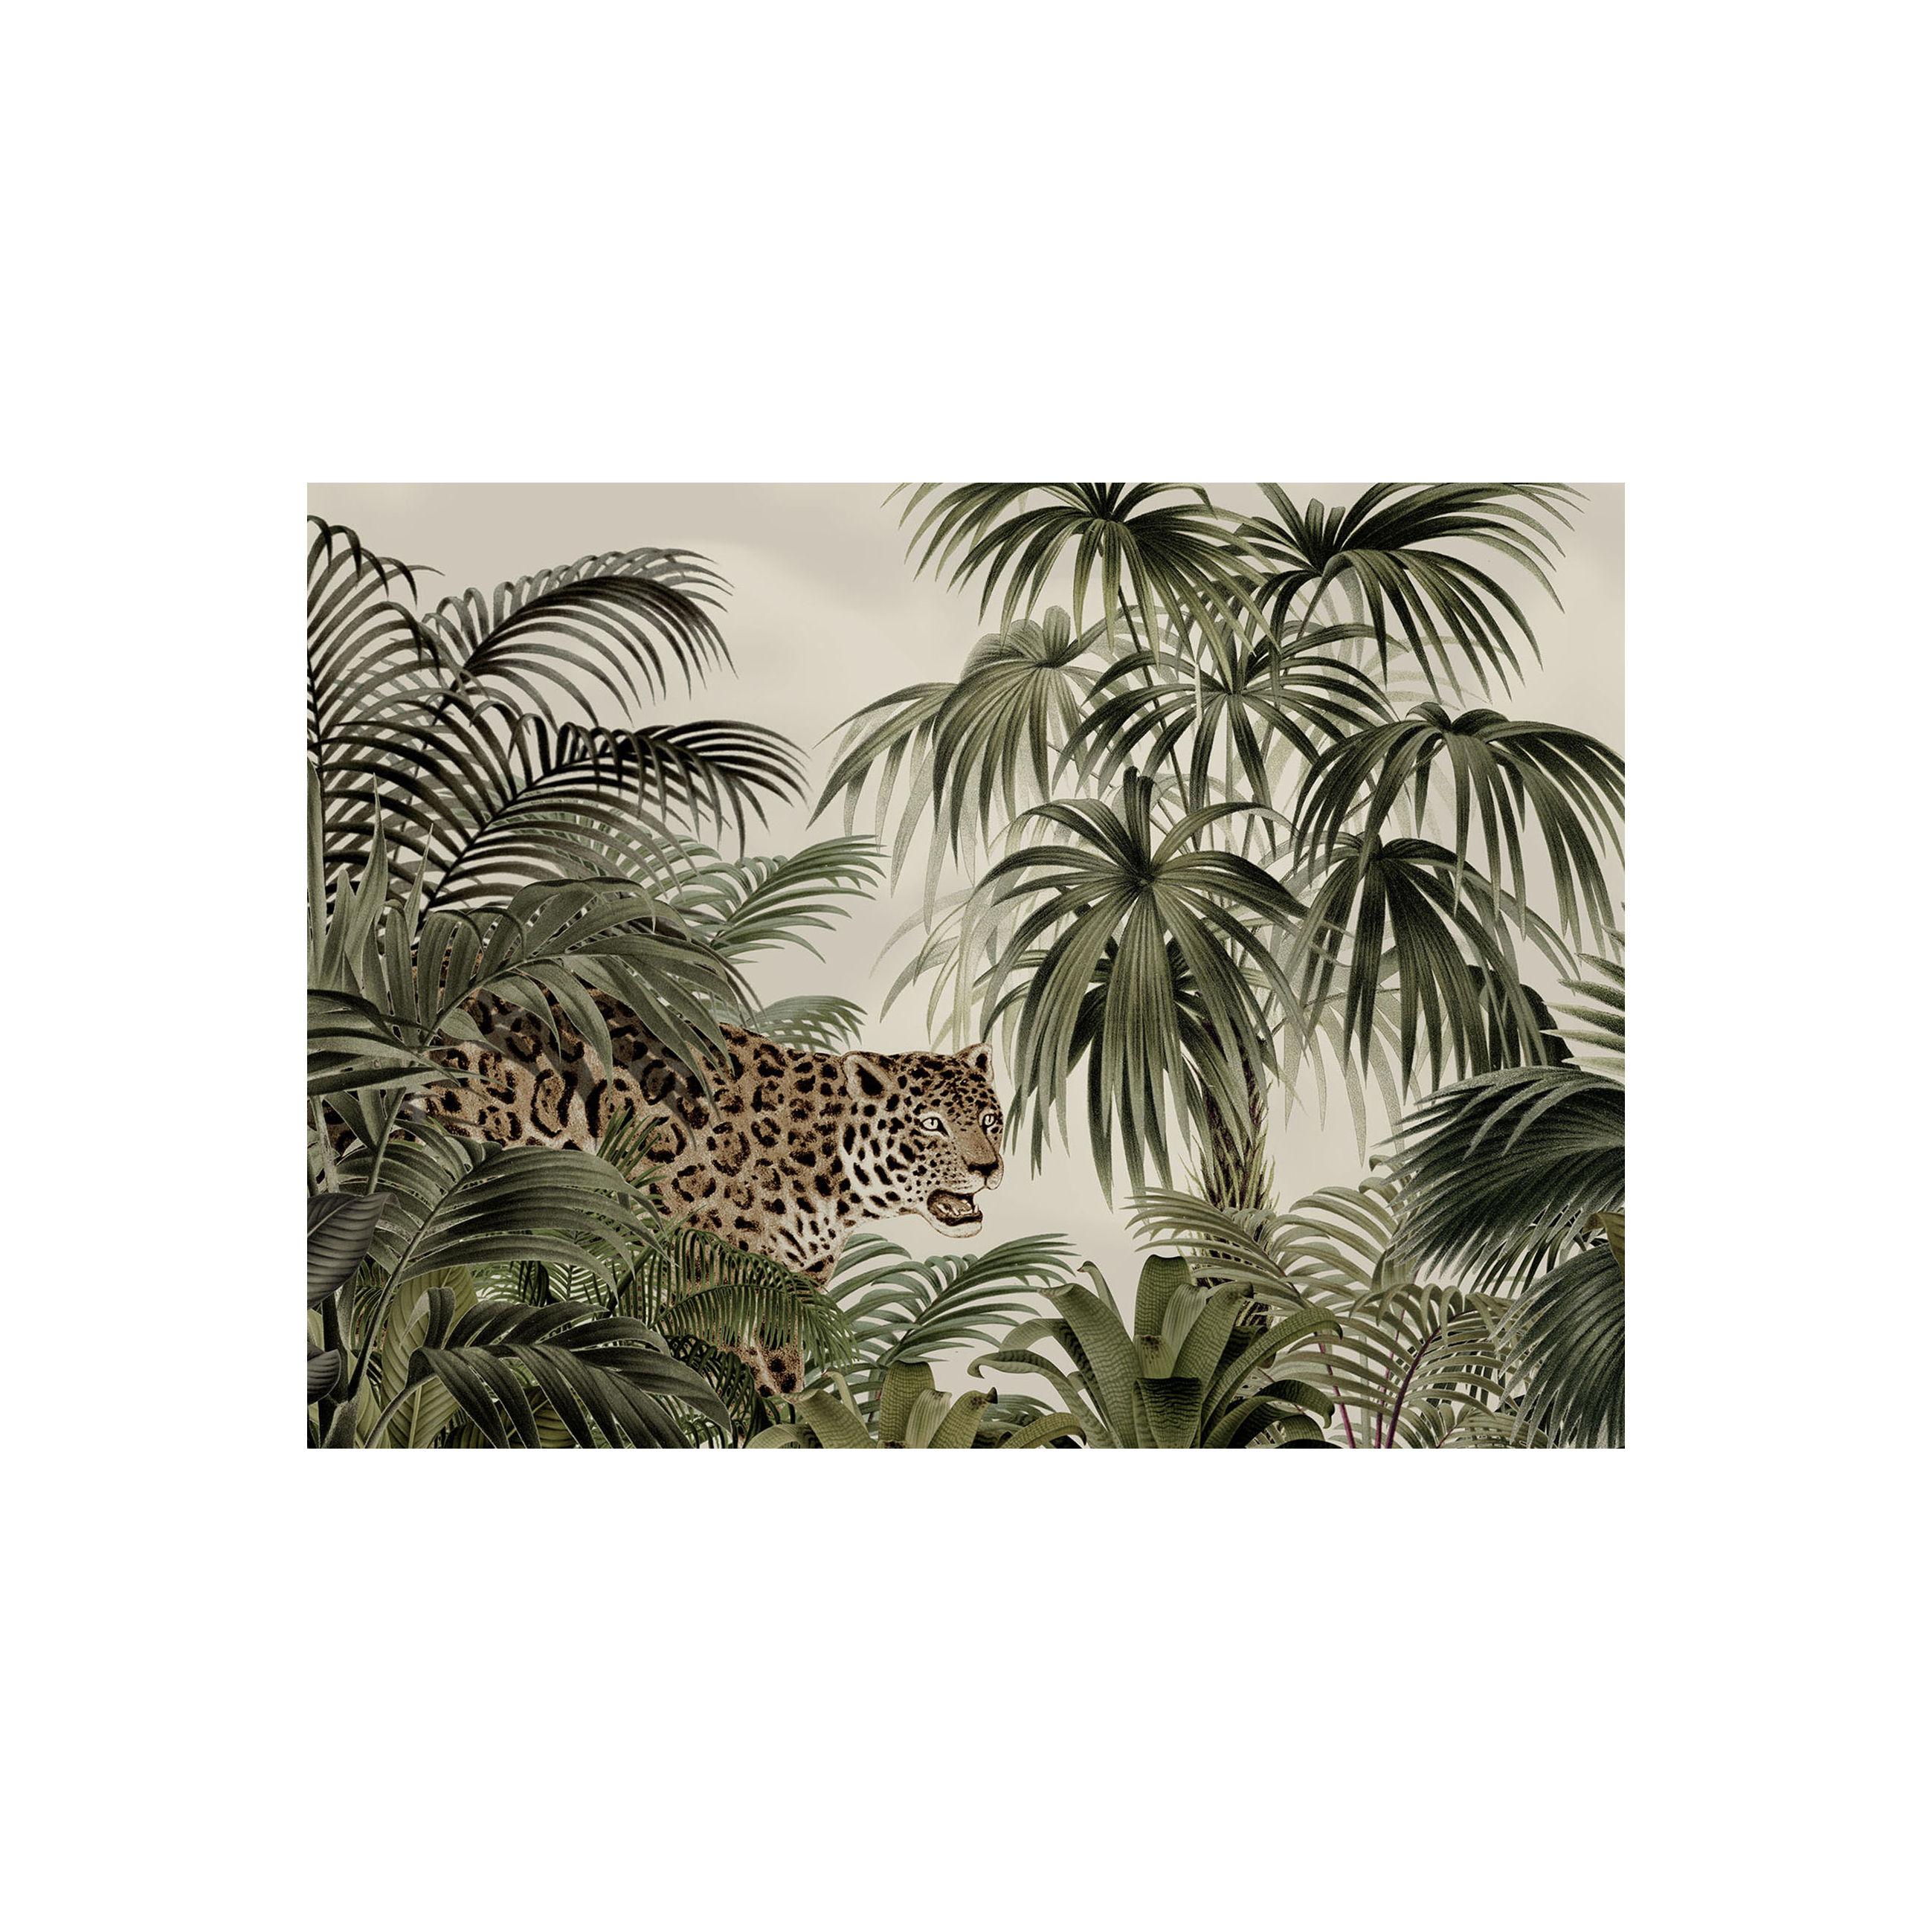 Tableware - Napkins & Tablecloths - Tresors Placemat - / Vinyl by Beaumont - Leopard / Green & beige - Vinal